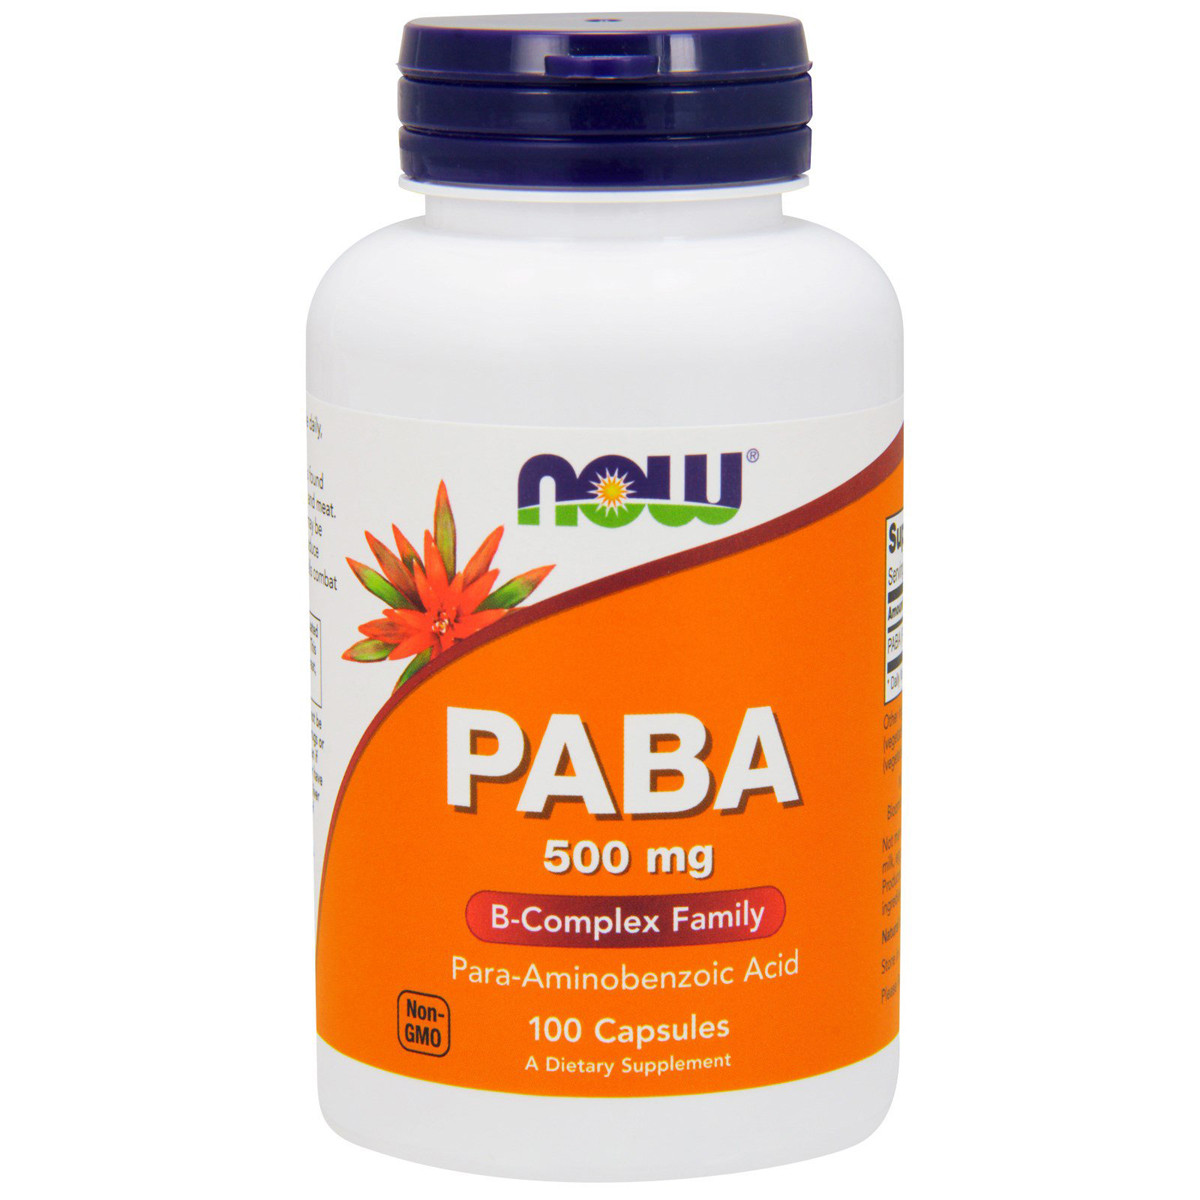 Пара-Аминобензойная Кислота (ПАБК), PABA, Now Foods, 500 мг, 100 капсул